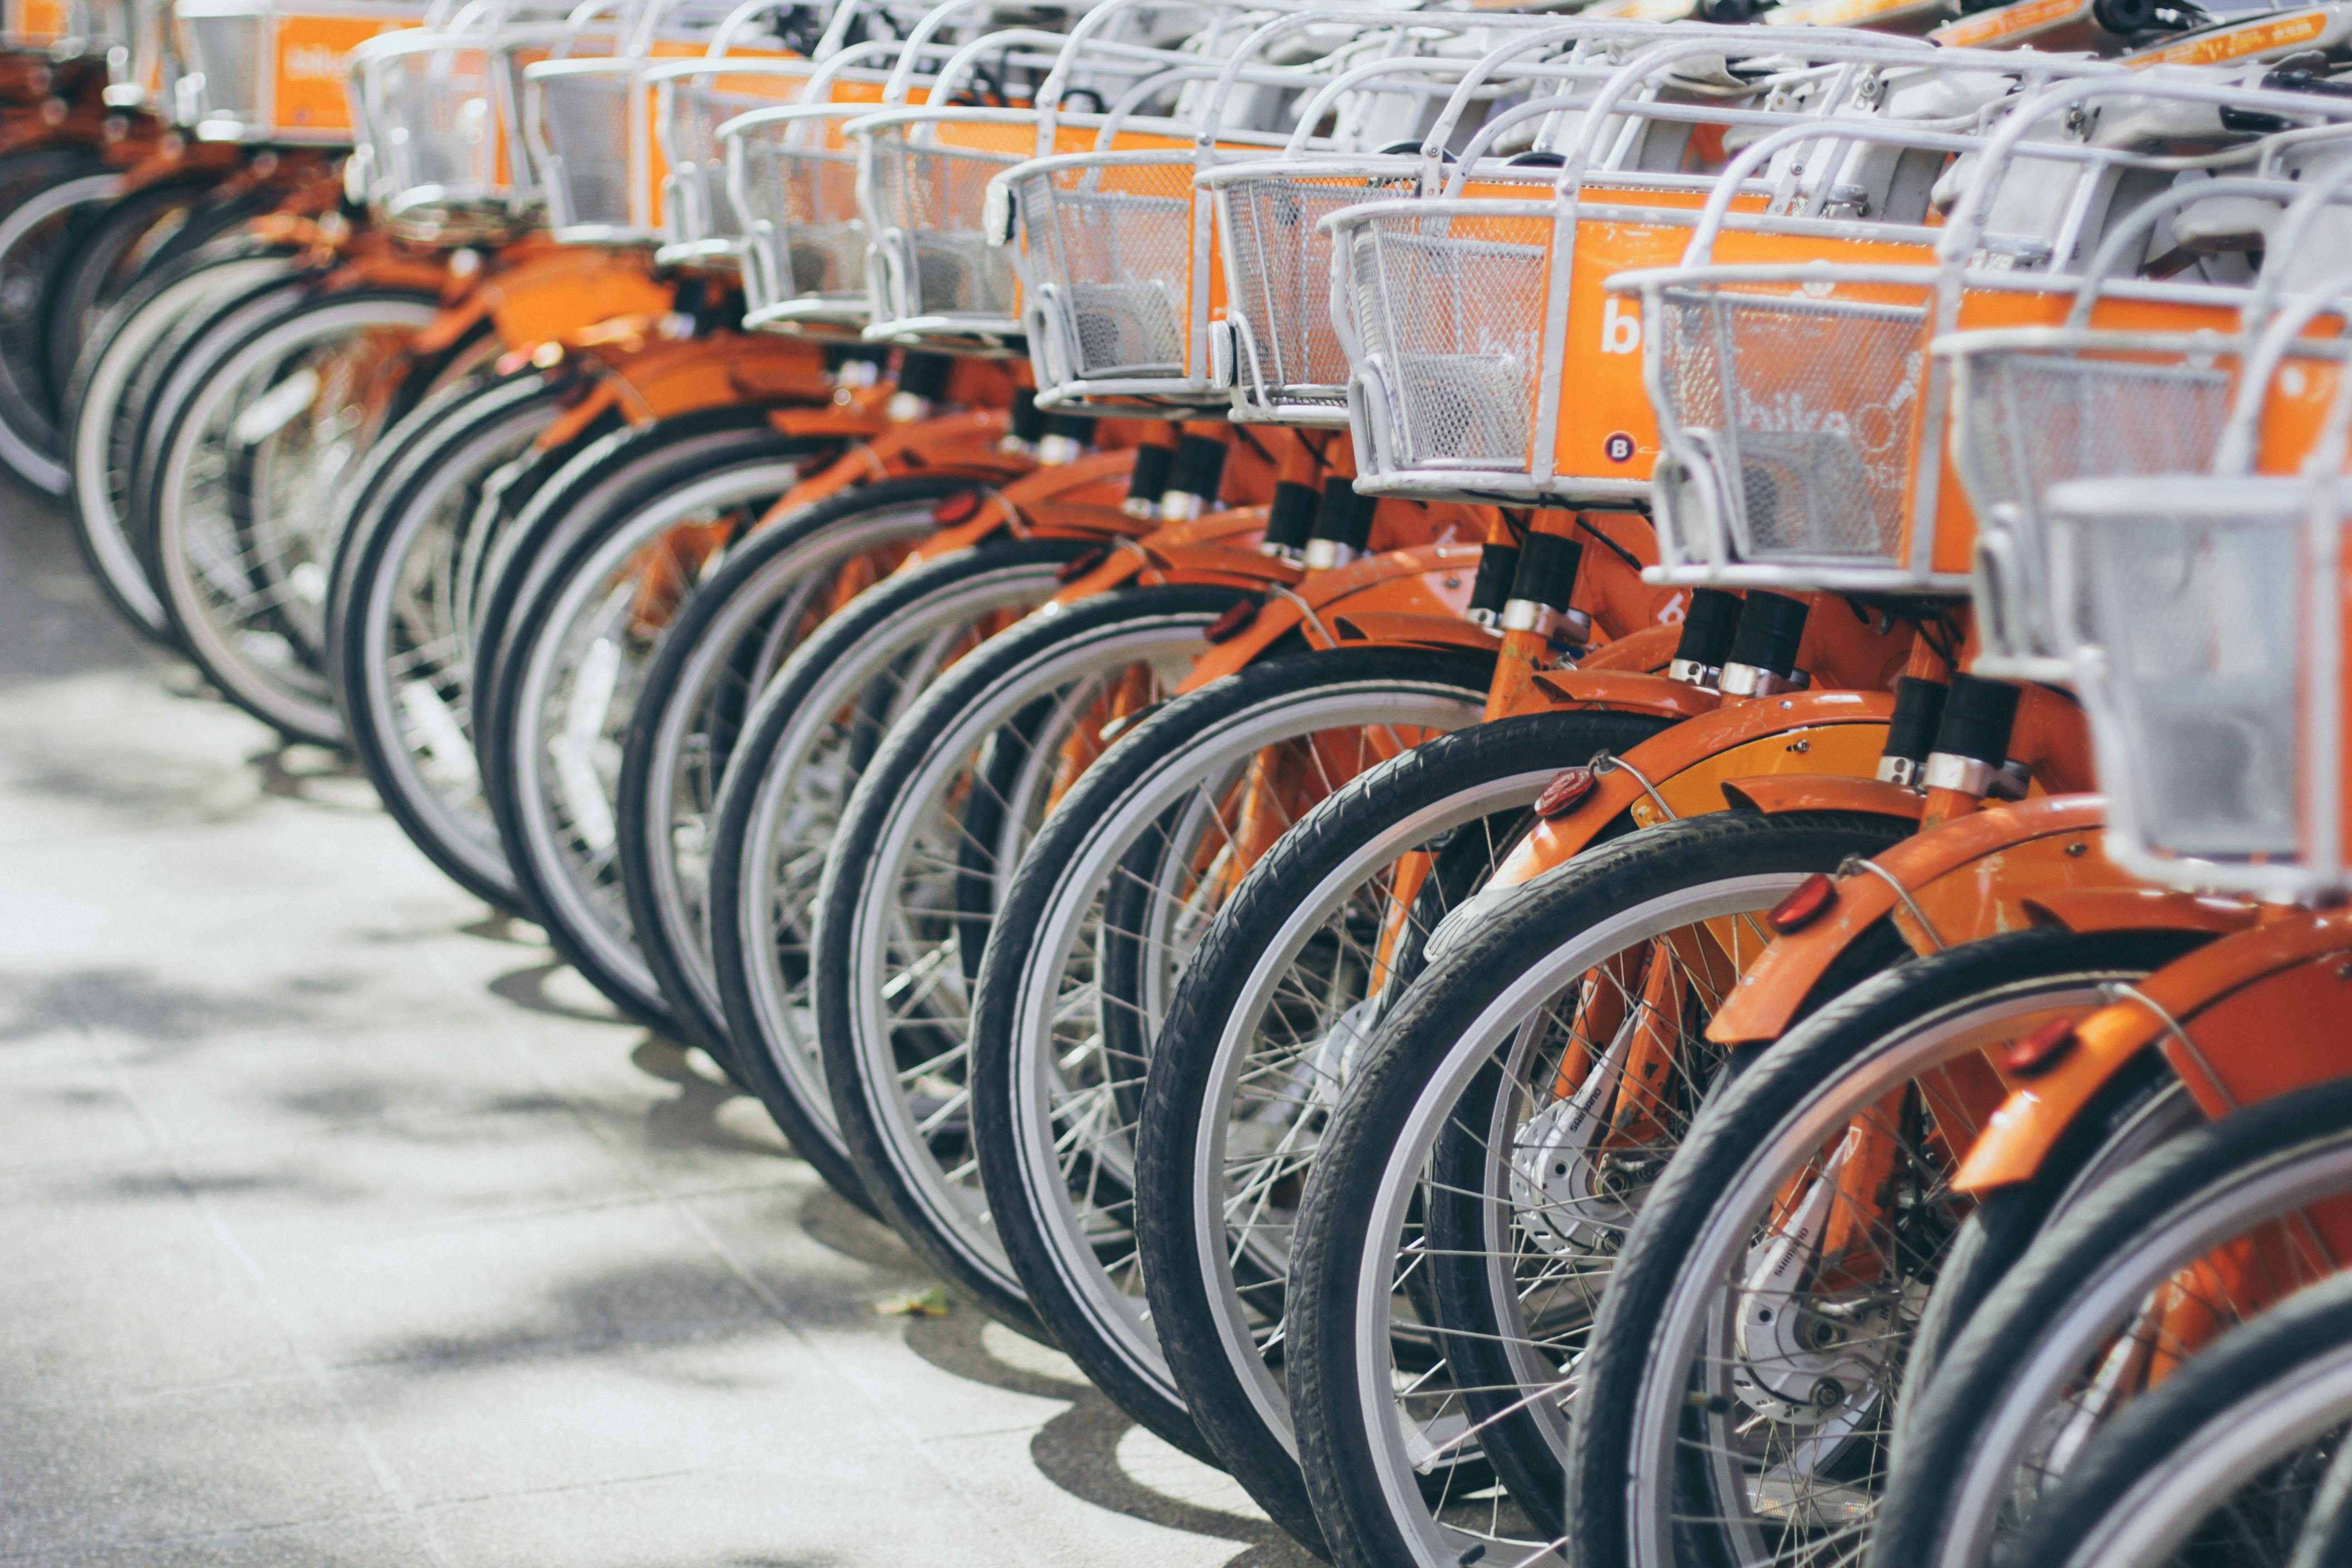 A long row of orange rental bicycles in Santiago